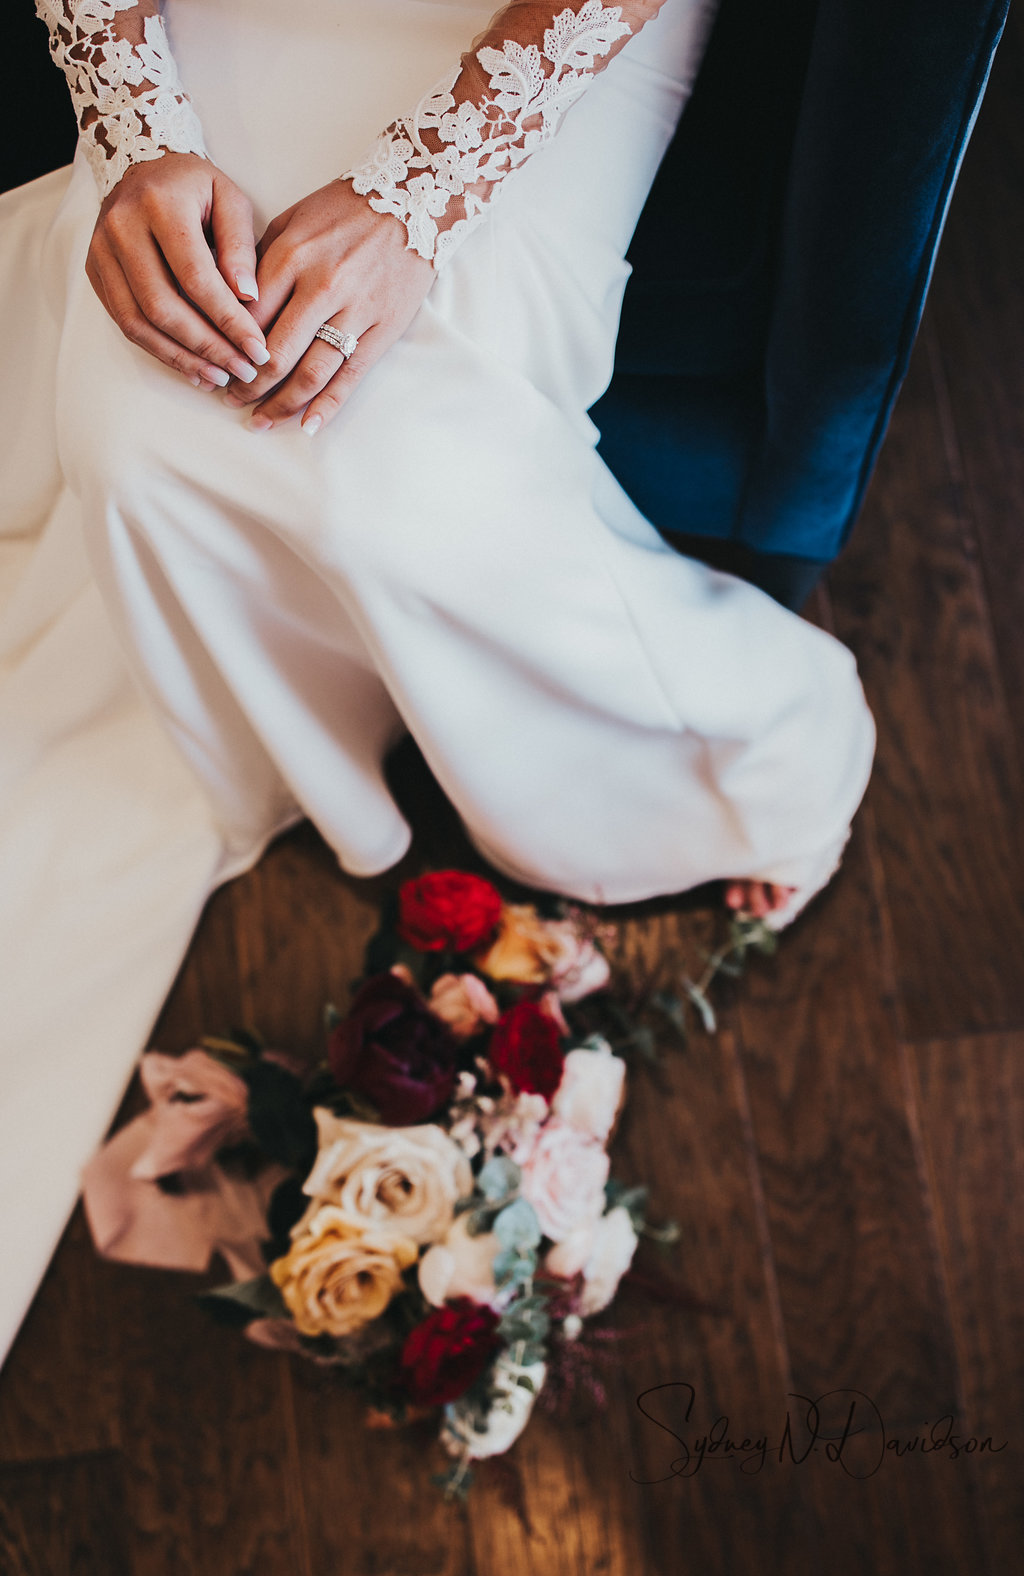 sydney-davidson-wedding-stillwater-oklahoma-wedding-session-traveling-photographer-portrait-tulsa-oklahoma-1855.jpg